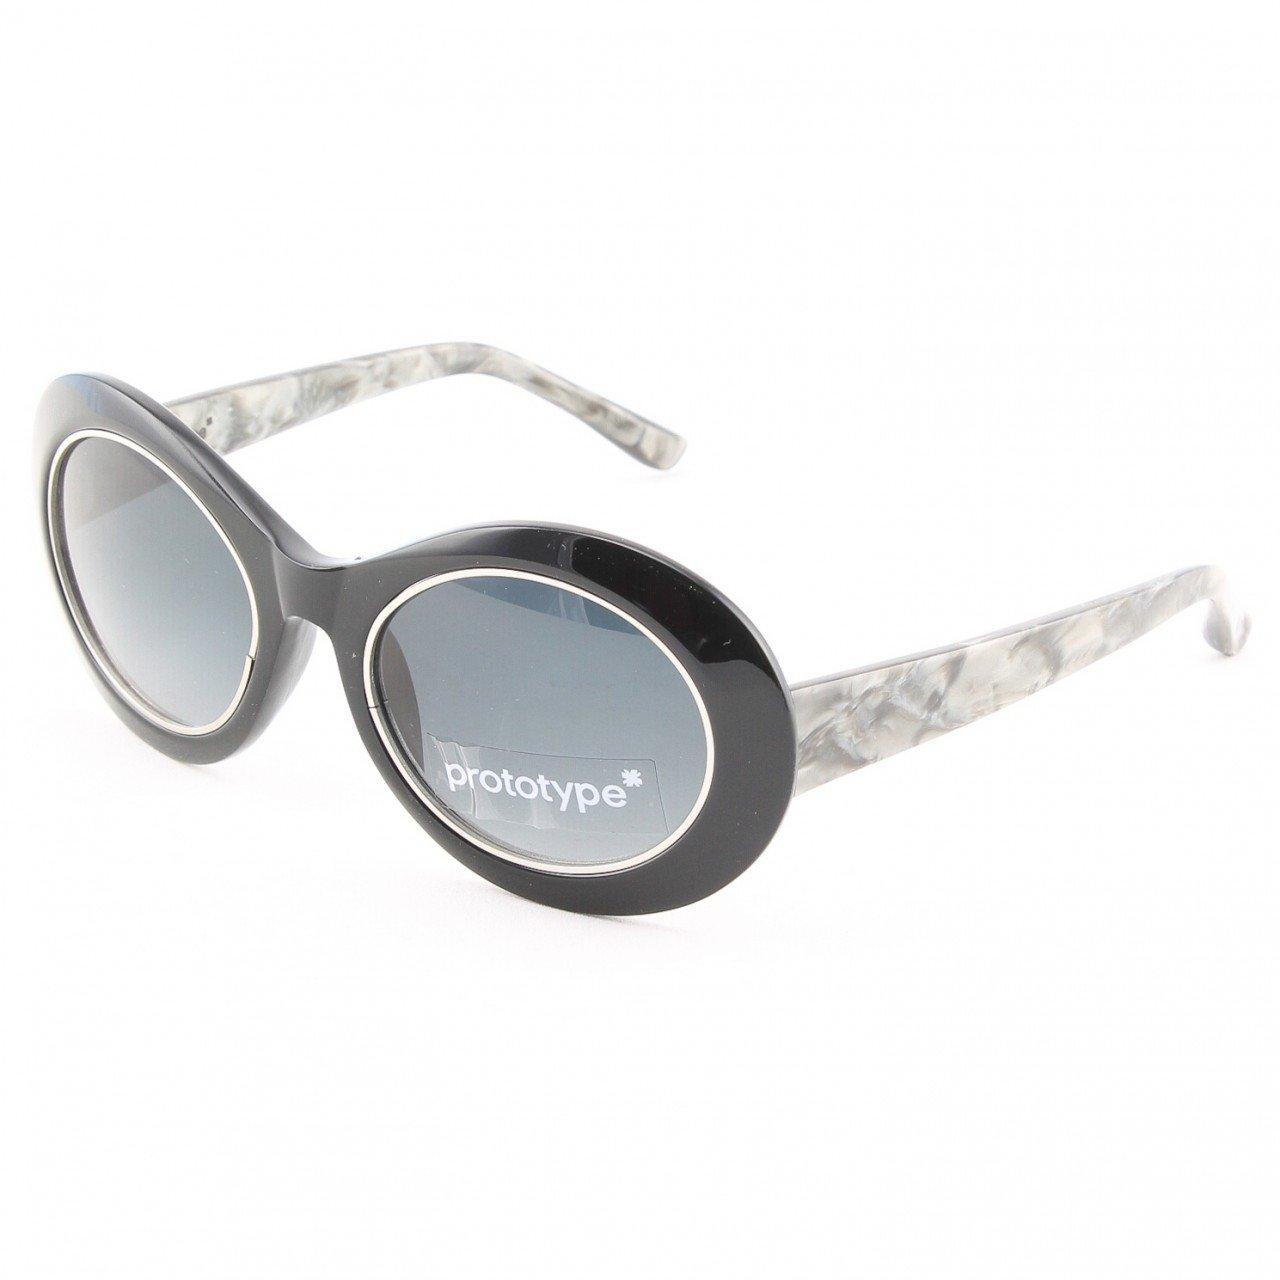 Prototype by Yohji Yamamoto Hornet Sunglasses Col. 02 Black Marble with Grey Gradient Lenses